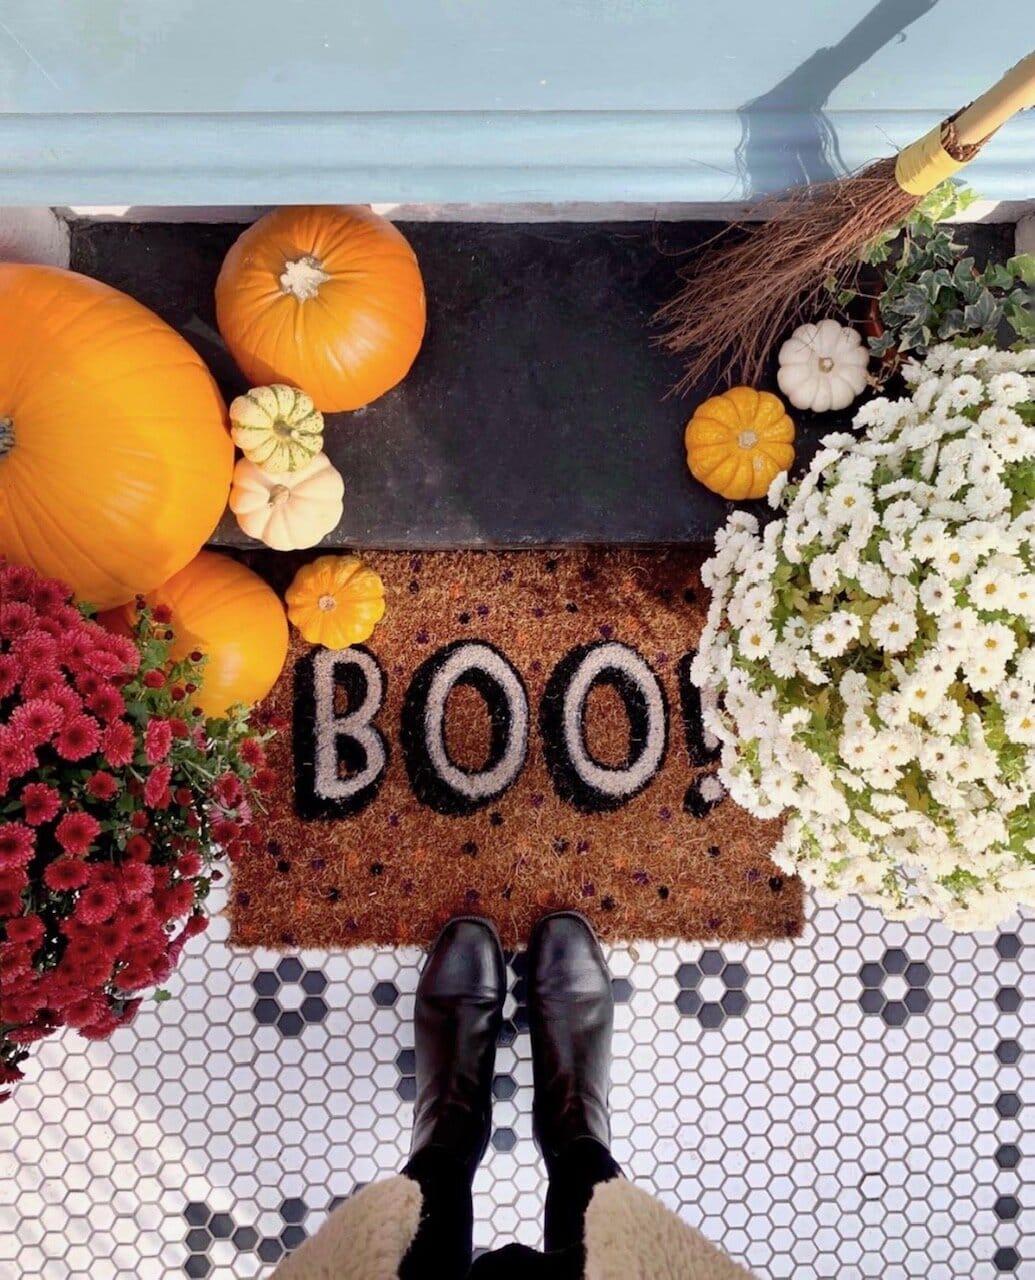 Boo to you too! The halloween decor extends to Jen's door mat in this post! Instagram  @thehousethatjenbuilt_